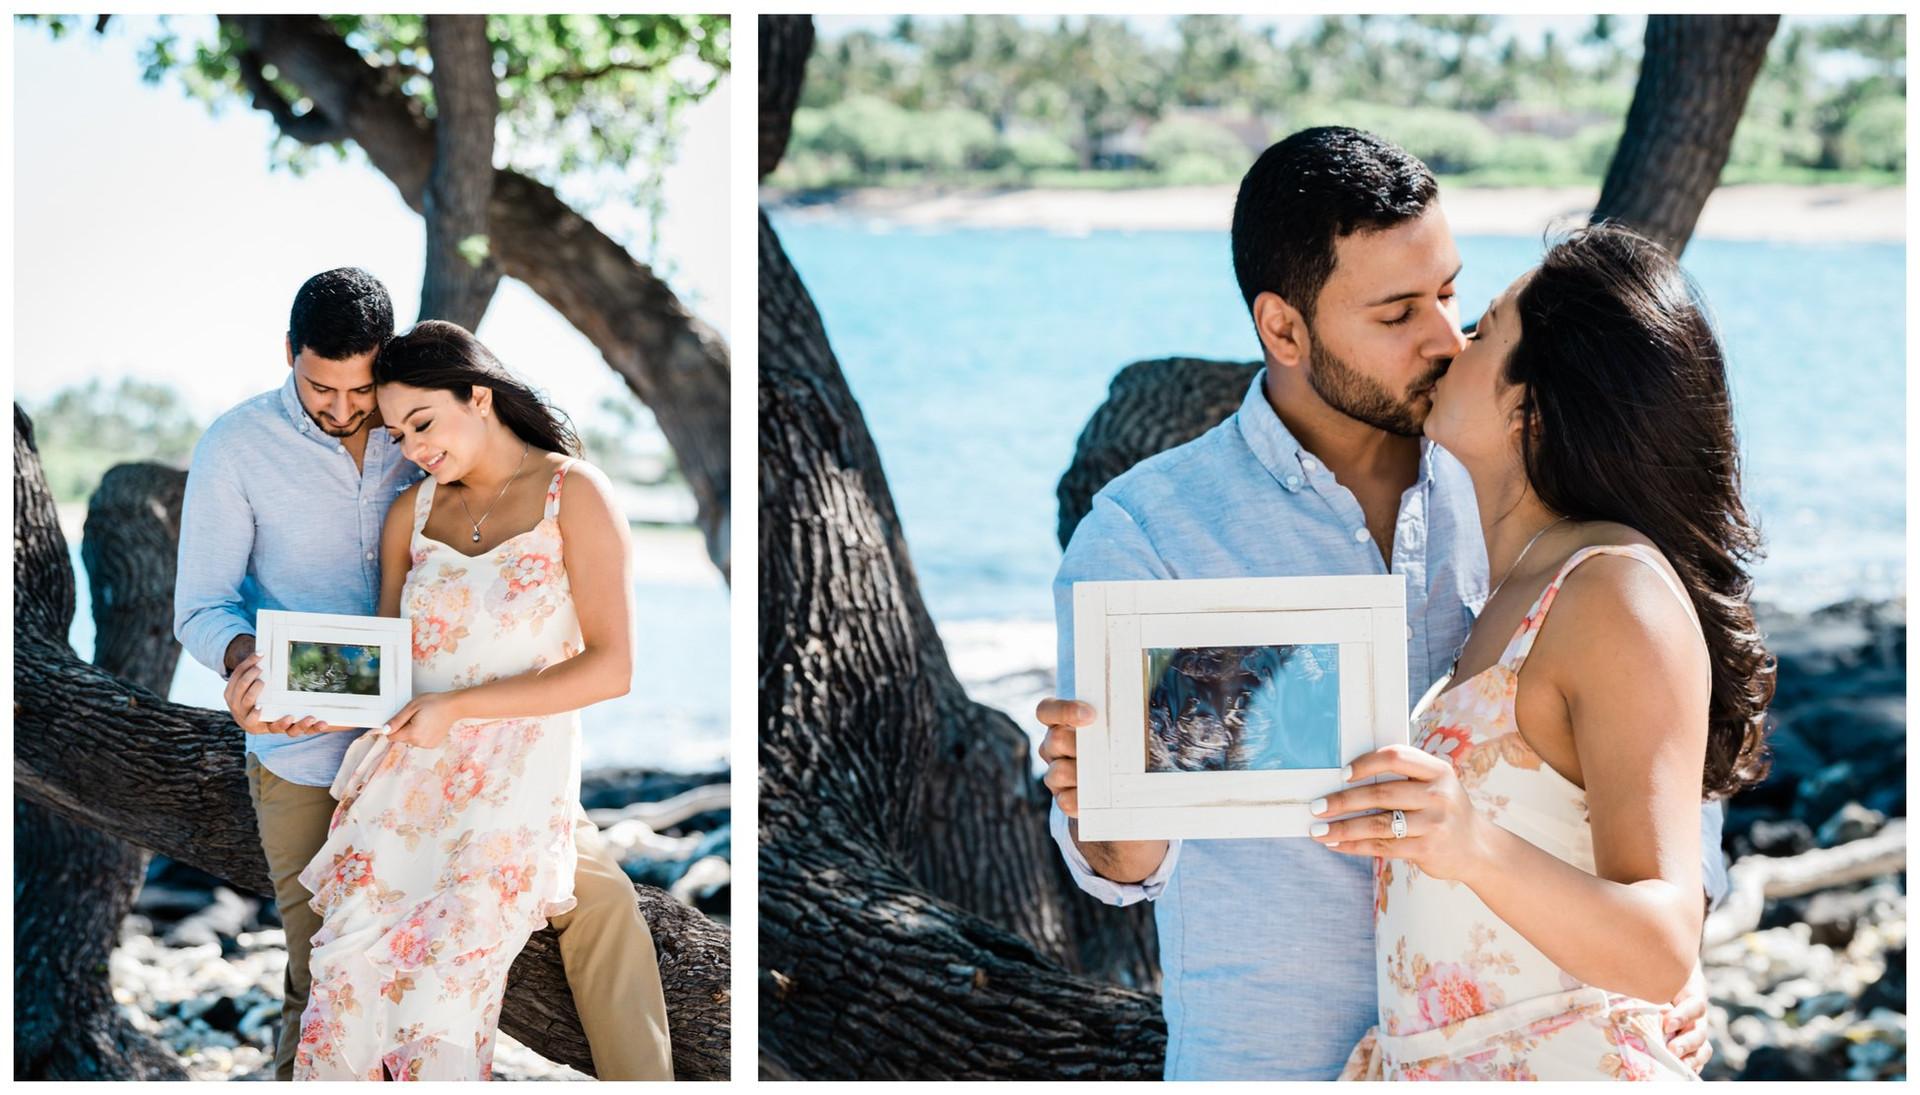 Hawaii Maternity Photographers 10a.jpg